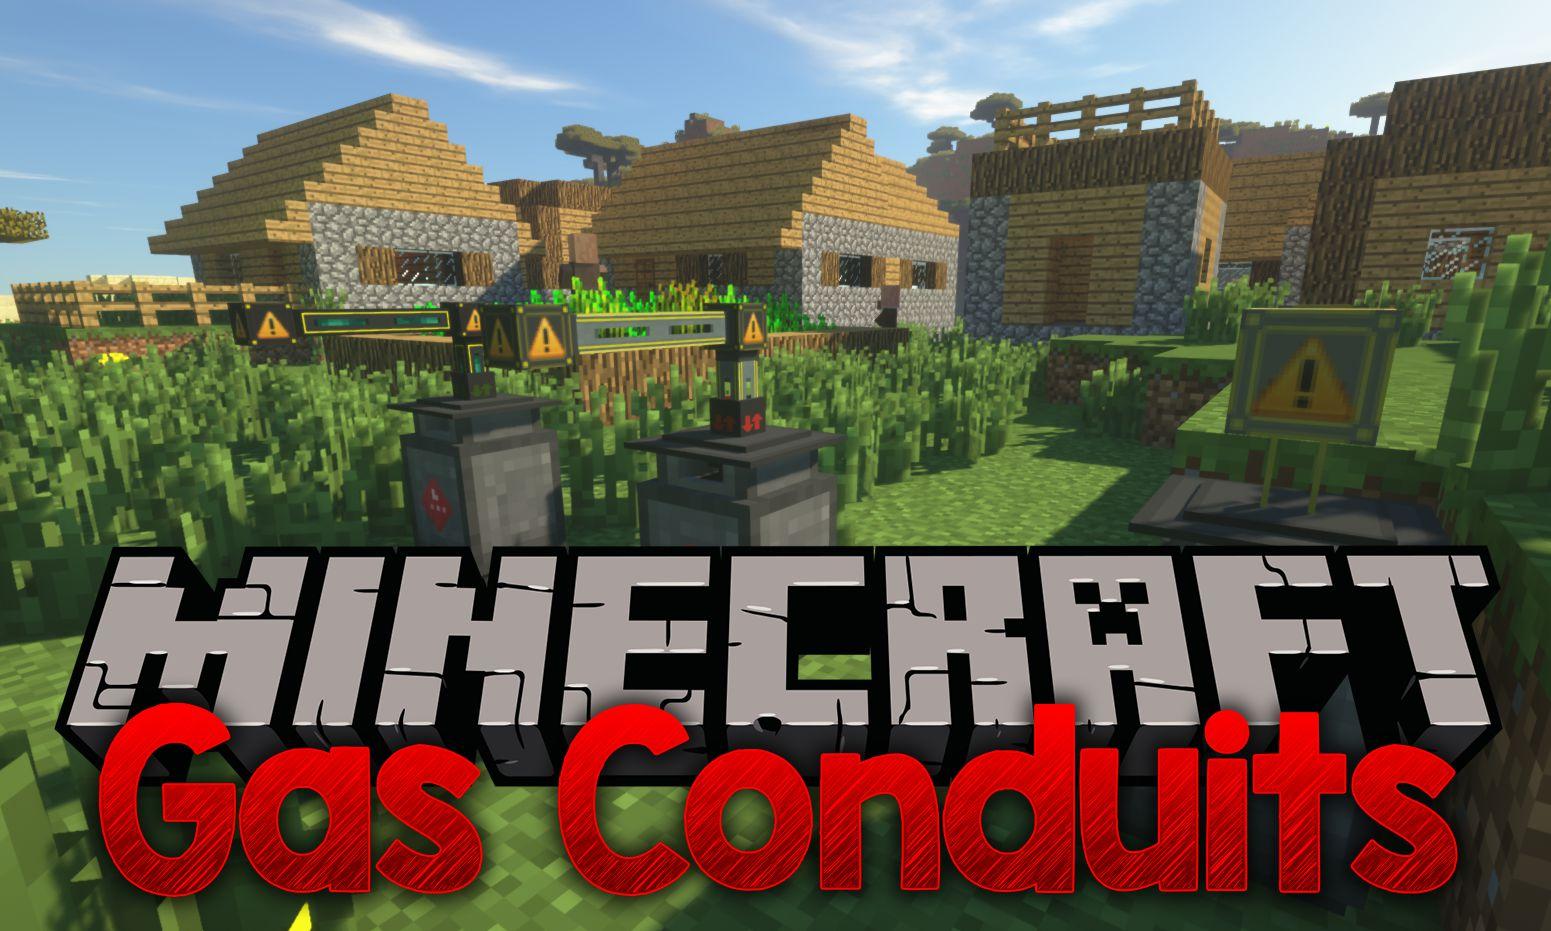 Gas Conduits mod for minecraft logo